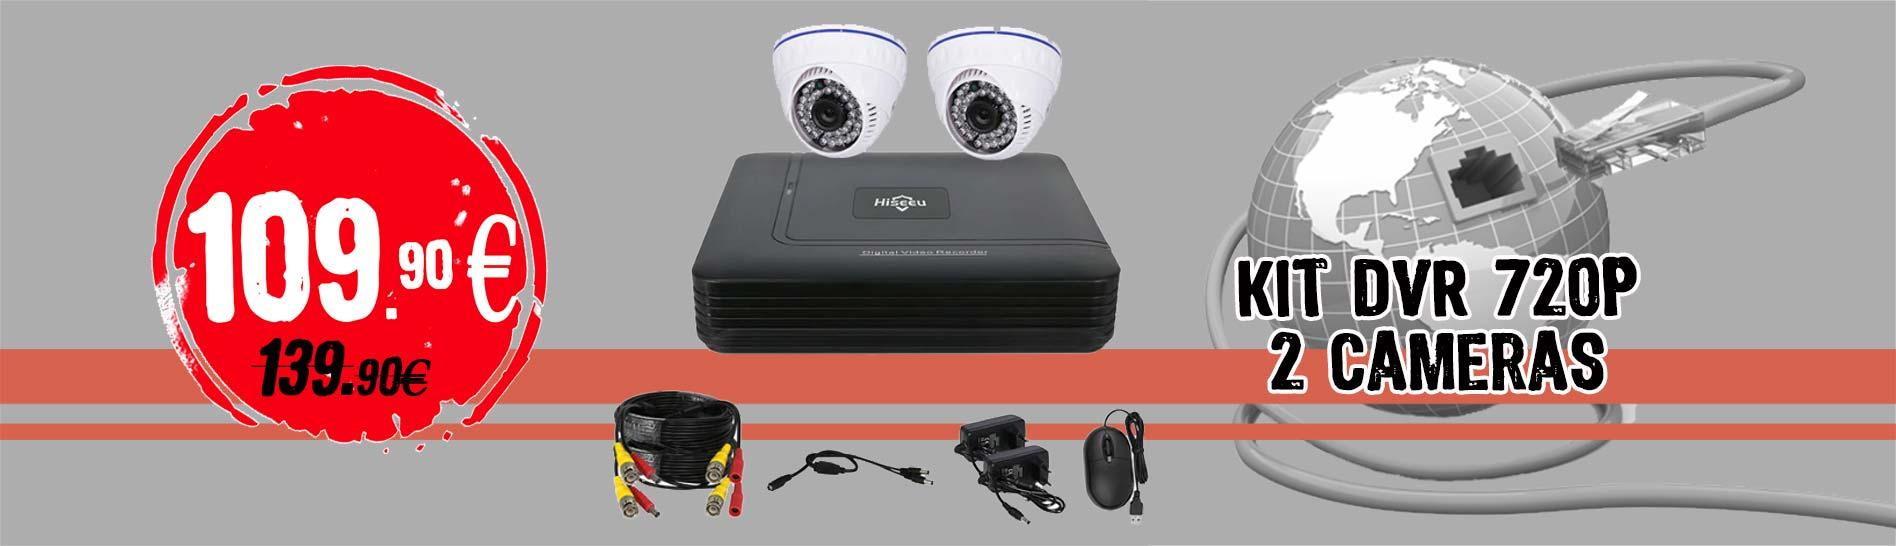 kit-dvr-720p-2cam-call-of-security-01